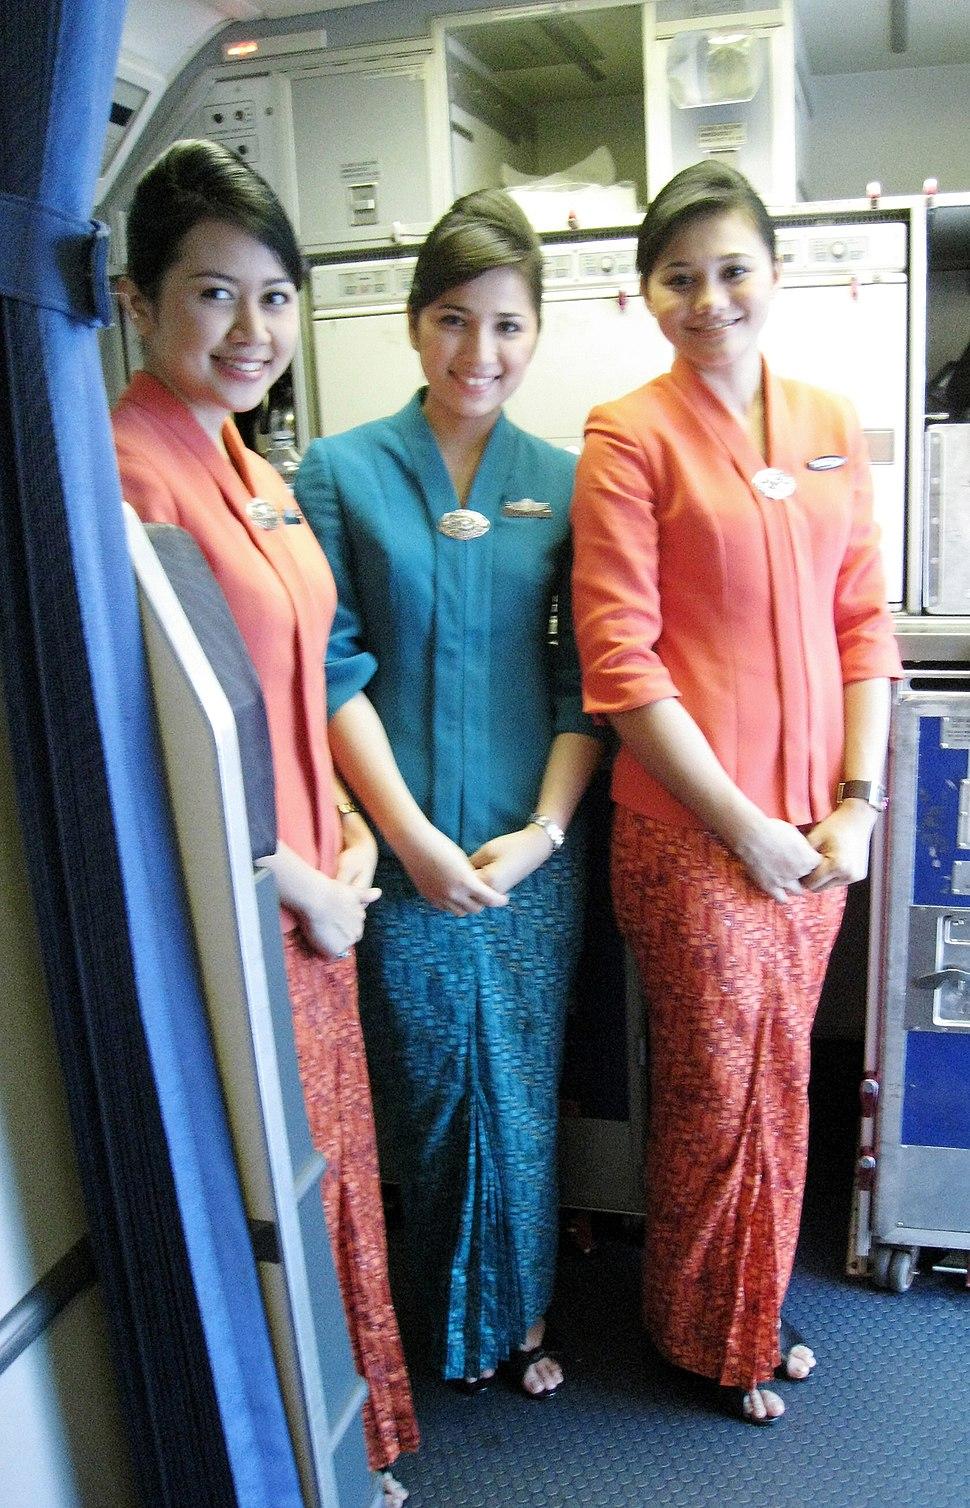 Garuda Indonesia Flight Attendants in Kebaya